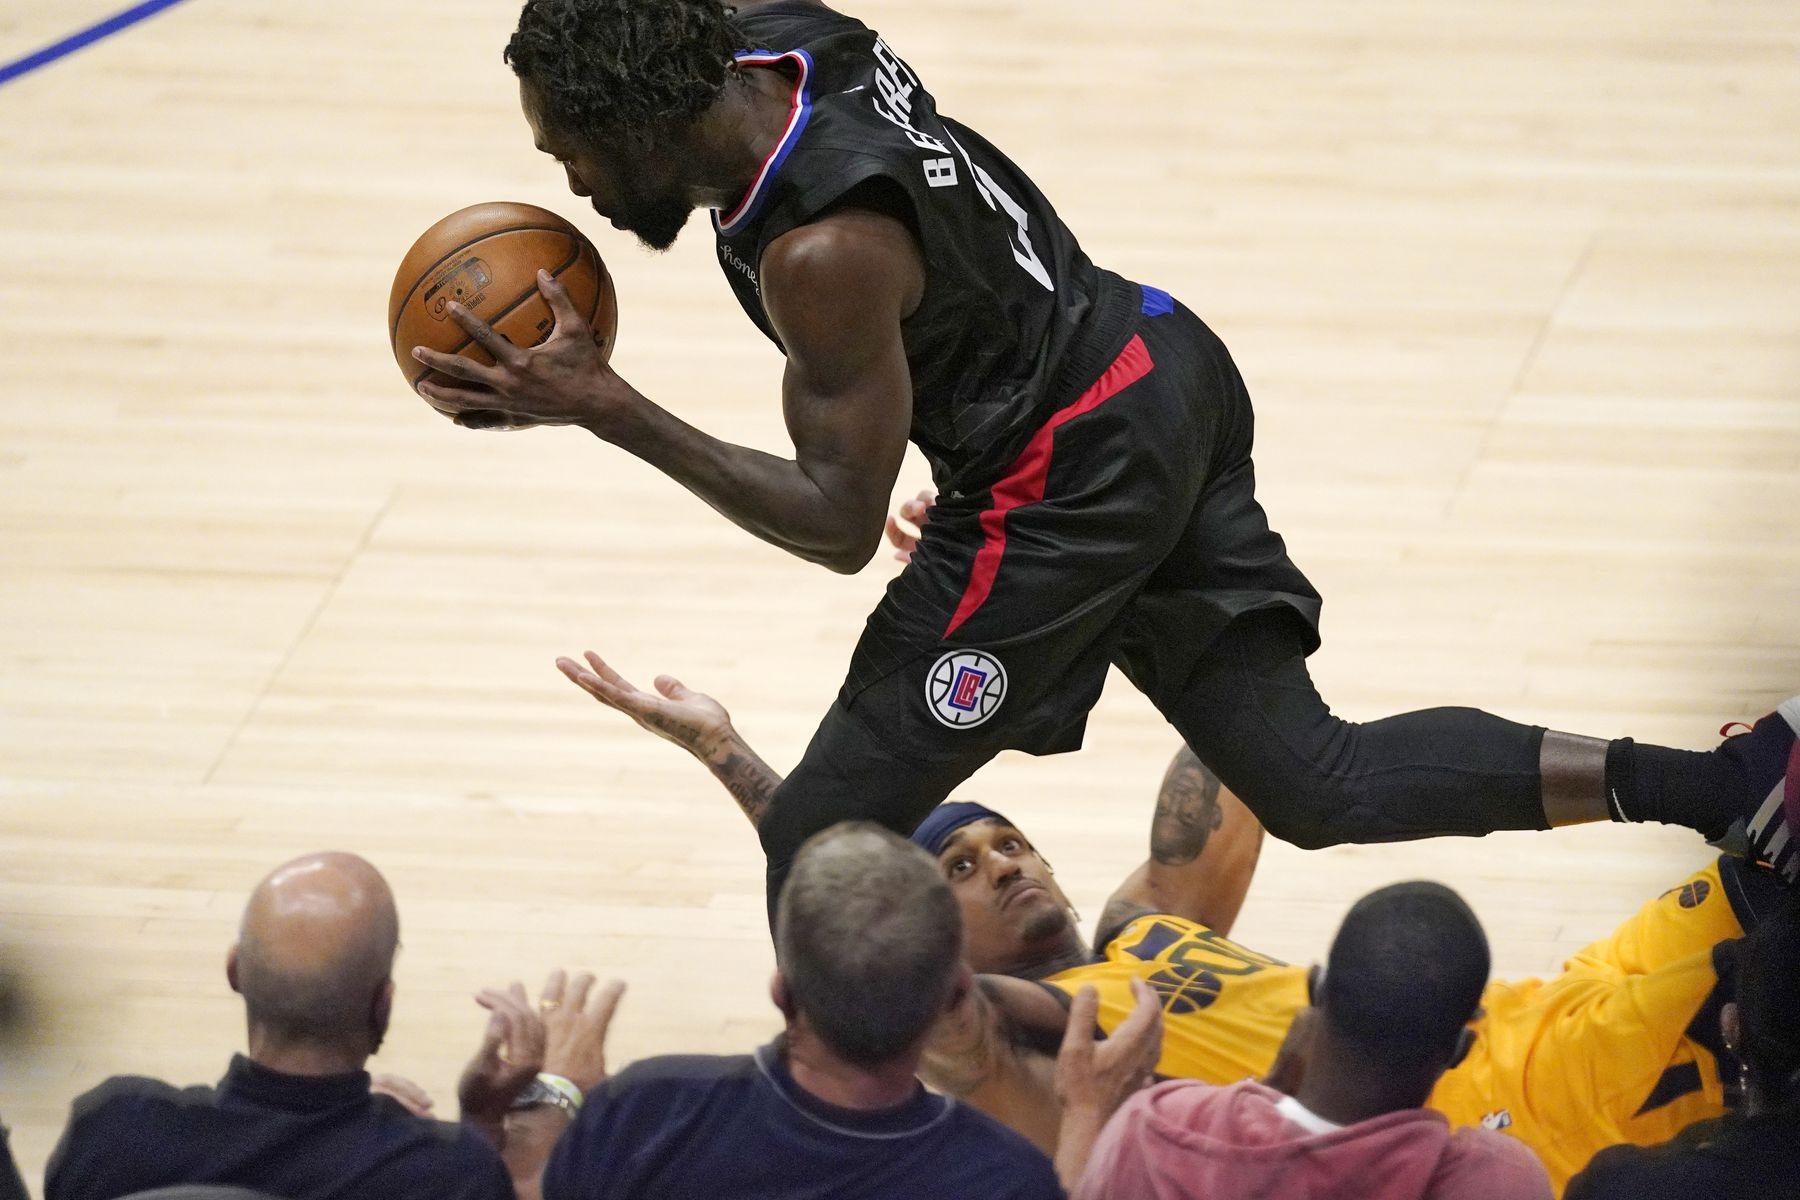 Los Angeles Clippers guard Patrick Beverley, top, dribbles as Utah Jazz guard Jordan Clarkson falls